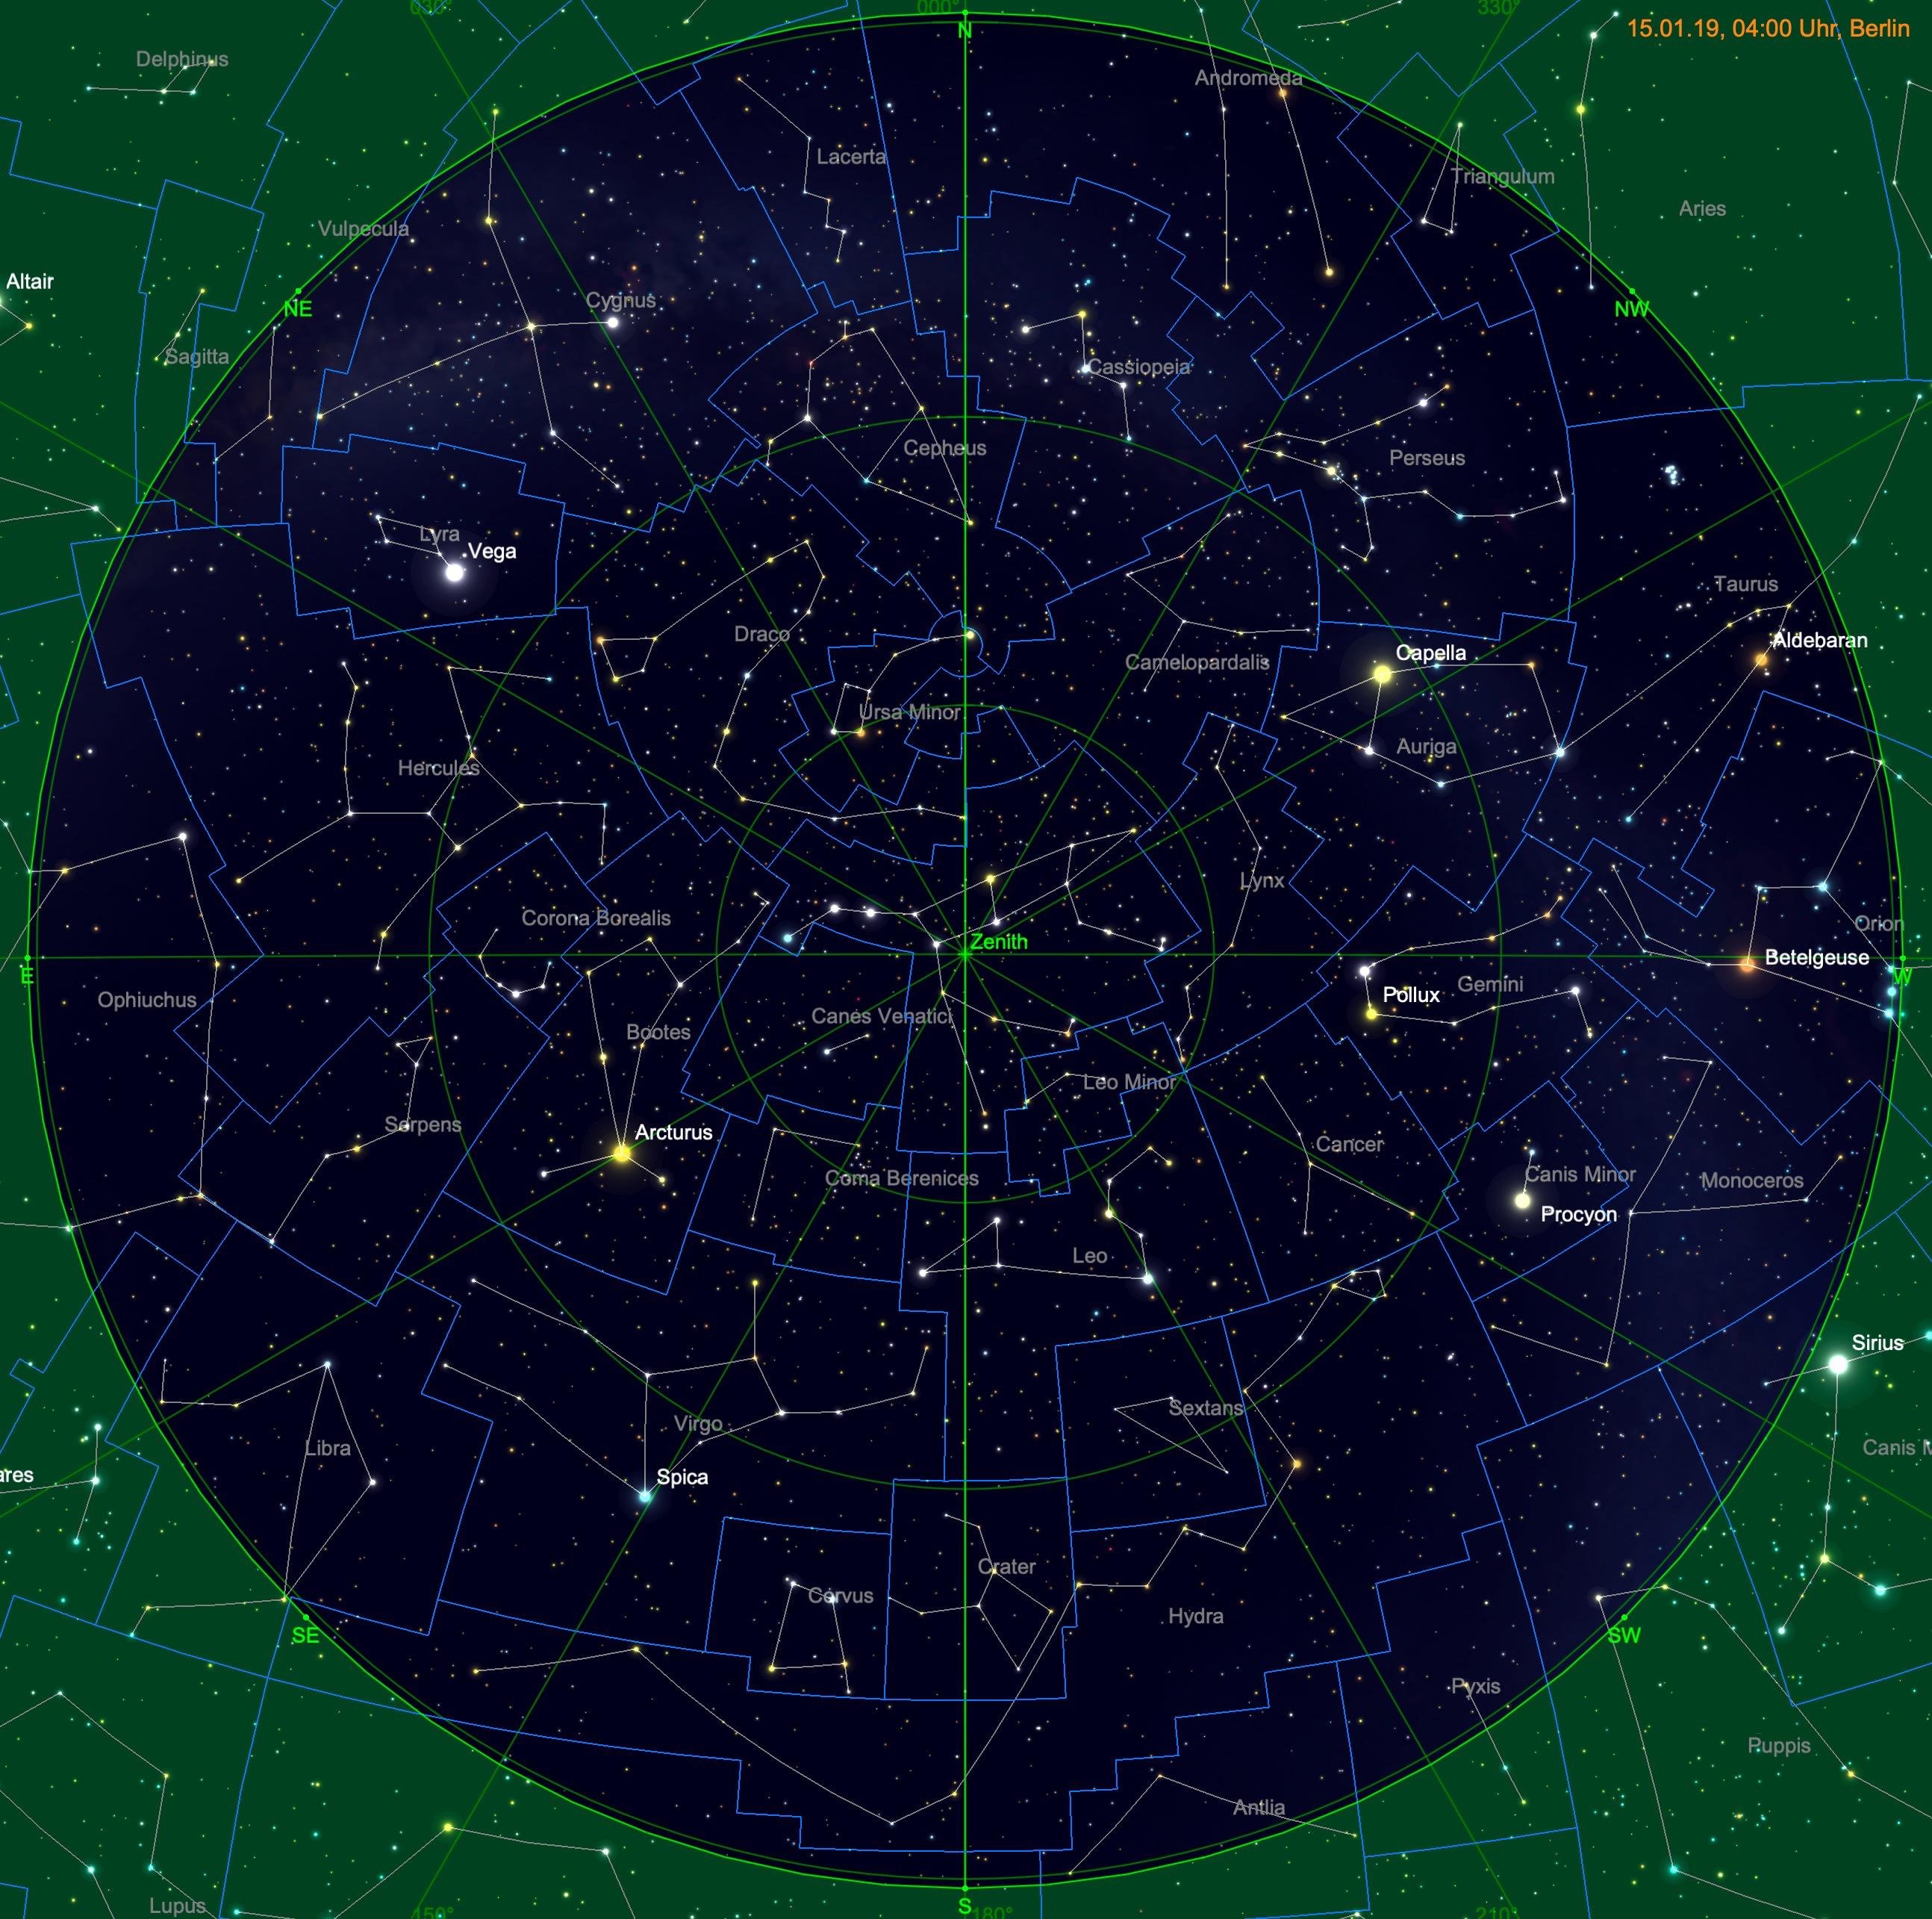 Sternhimmel am 15. Januar um 04:00 Uhr